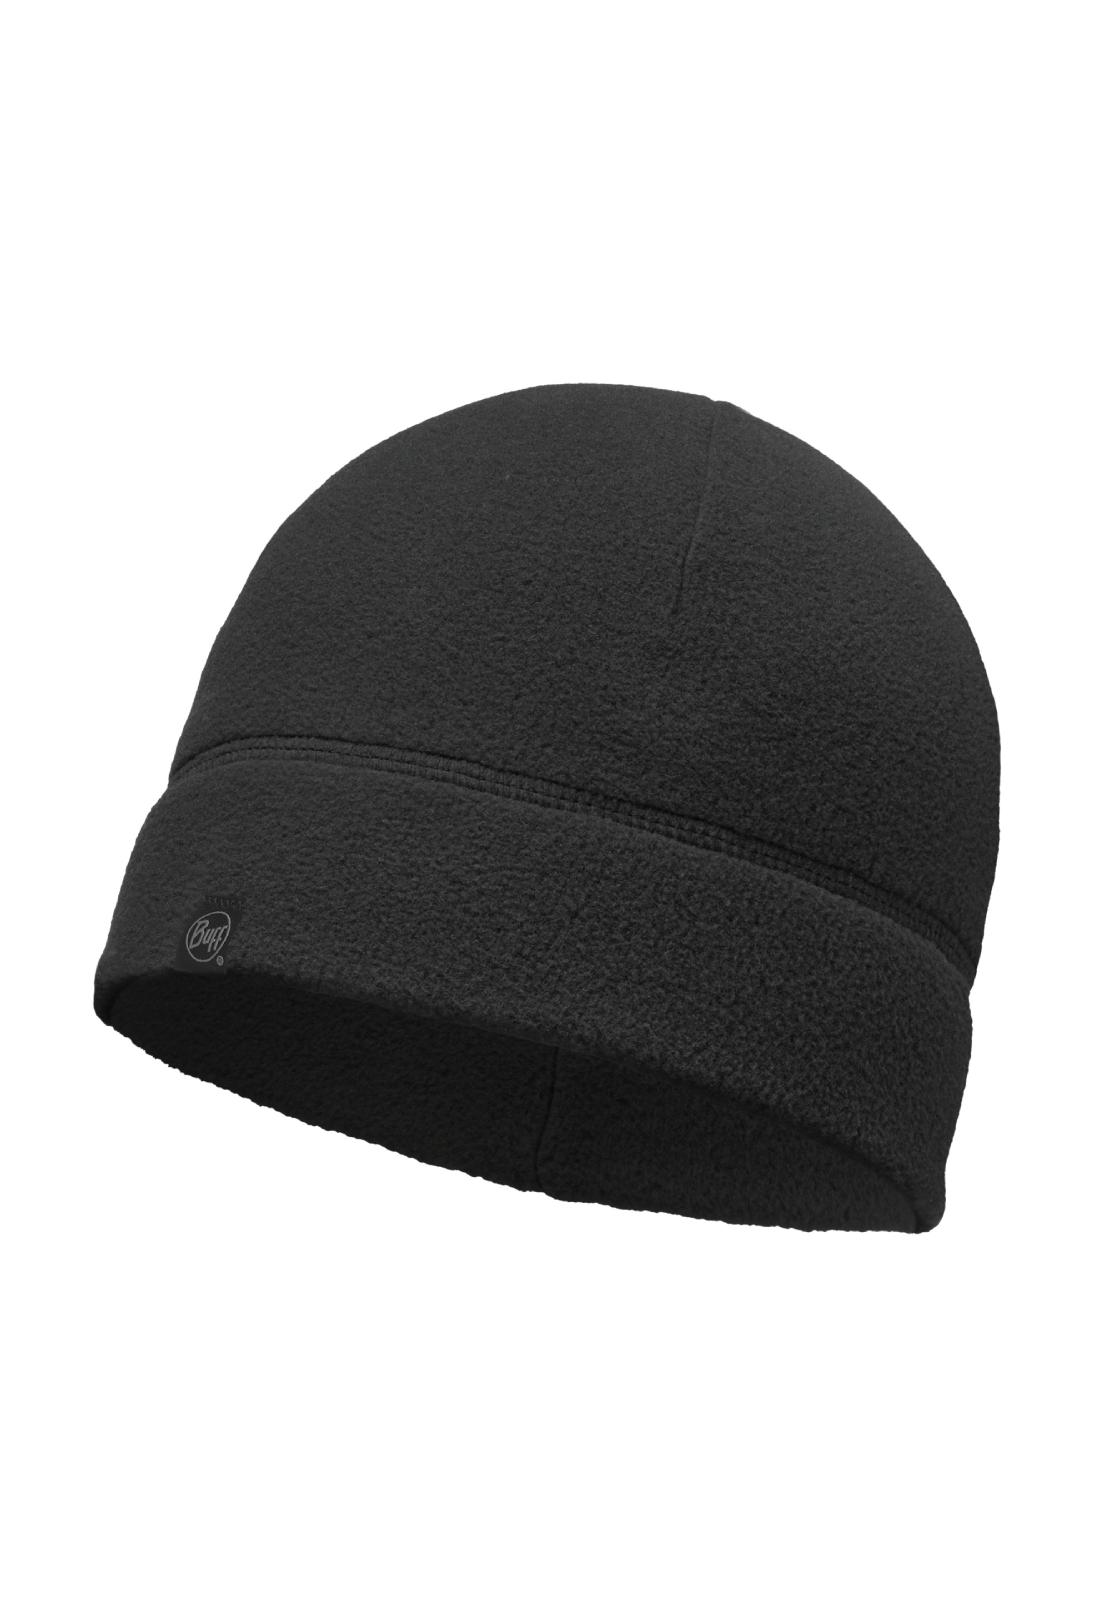 Kids Polar Hat Solid Black